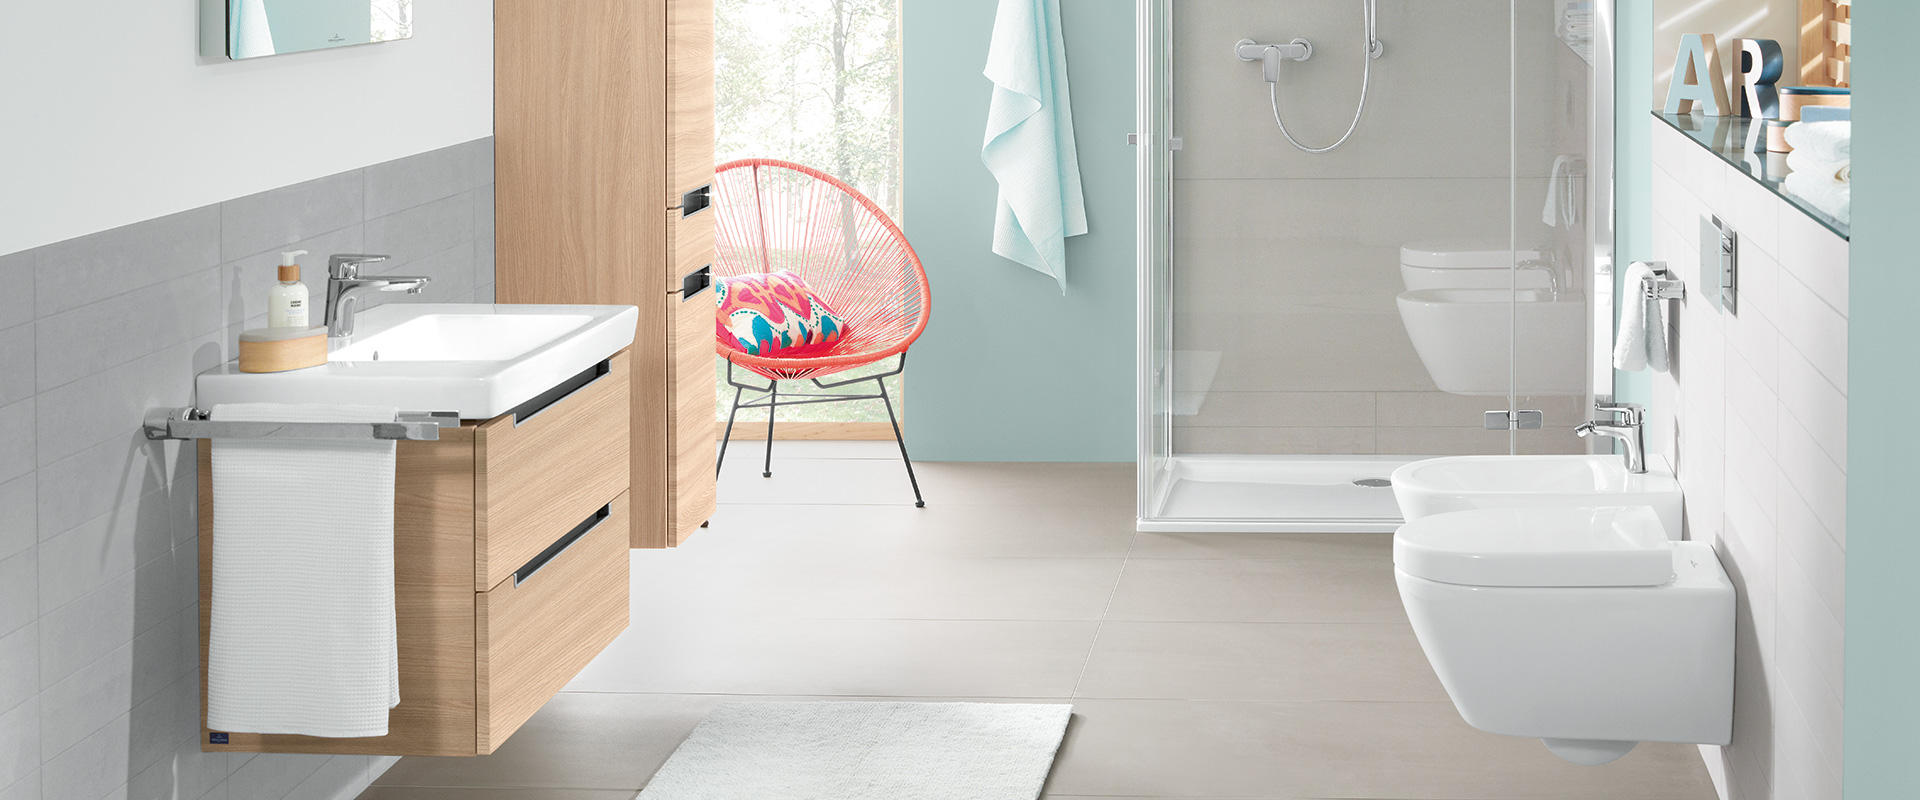 subway 2 0 diversiteit en individualiteit in de badkamer villeroy boch. Black Bedroom Furniture Sets. Home Design Ideas